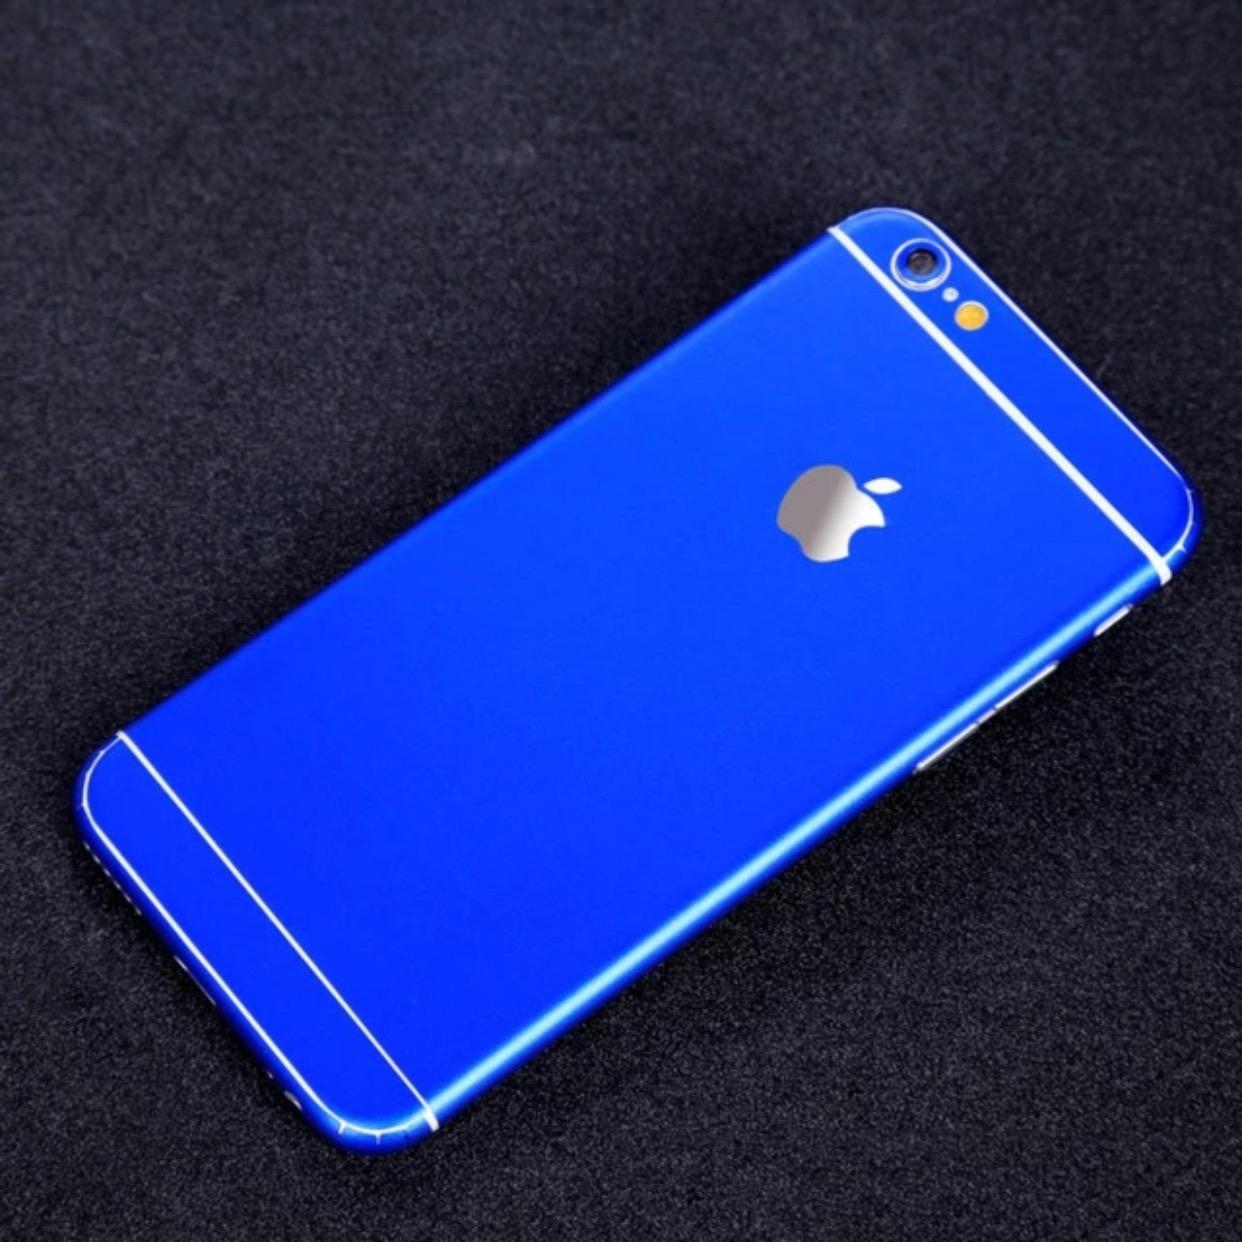 Matte Royal Blue iPhone Sticker Skin Cover